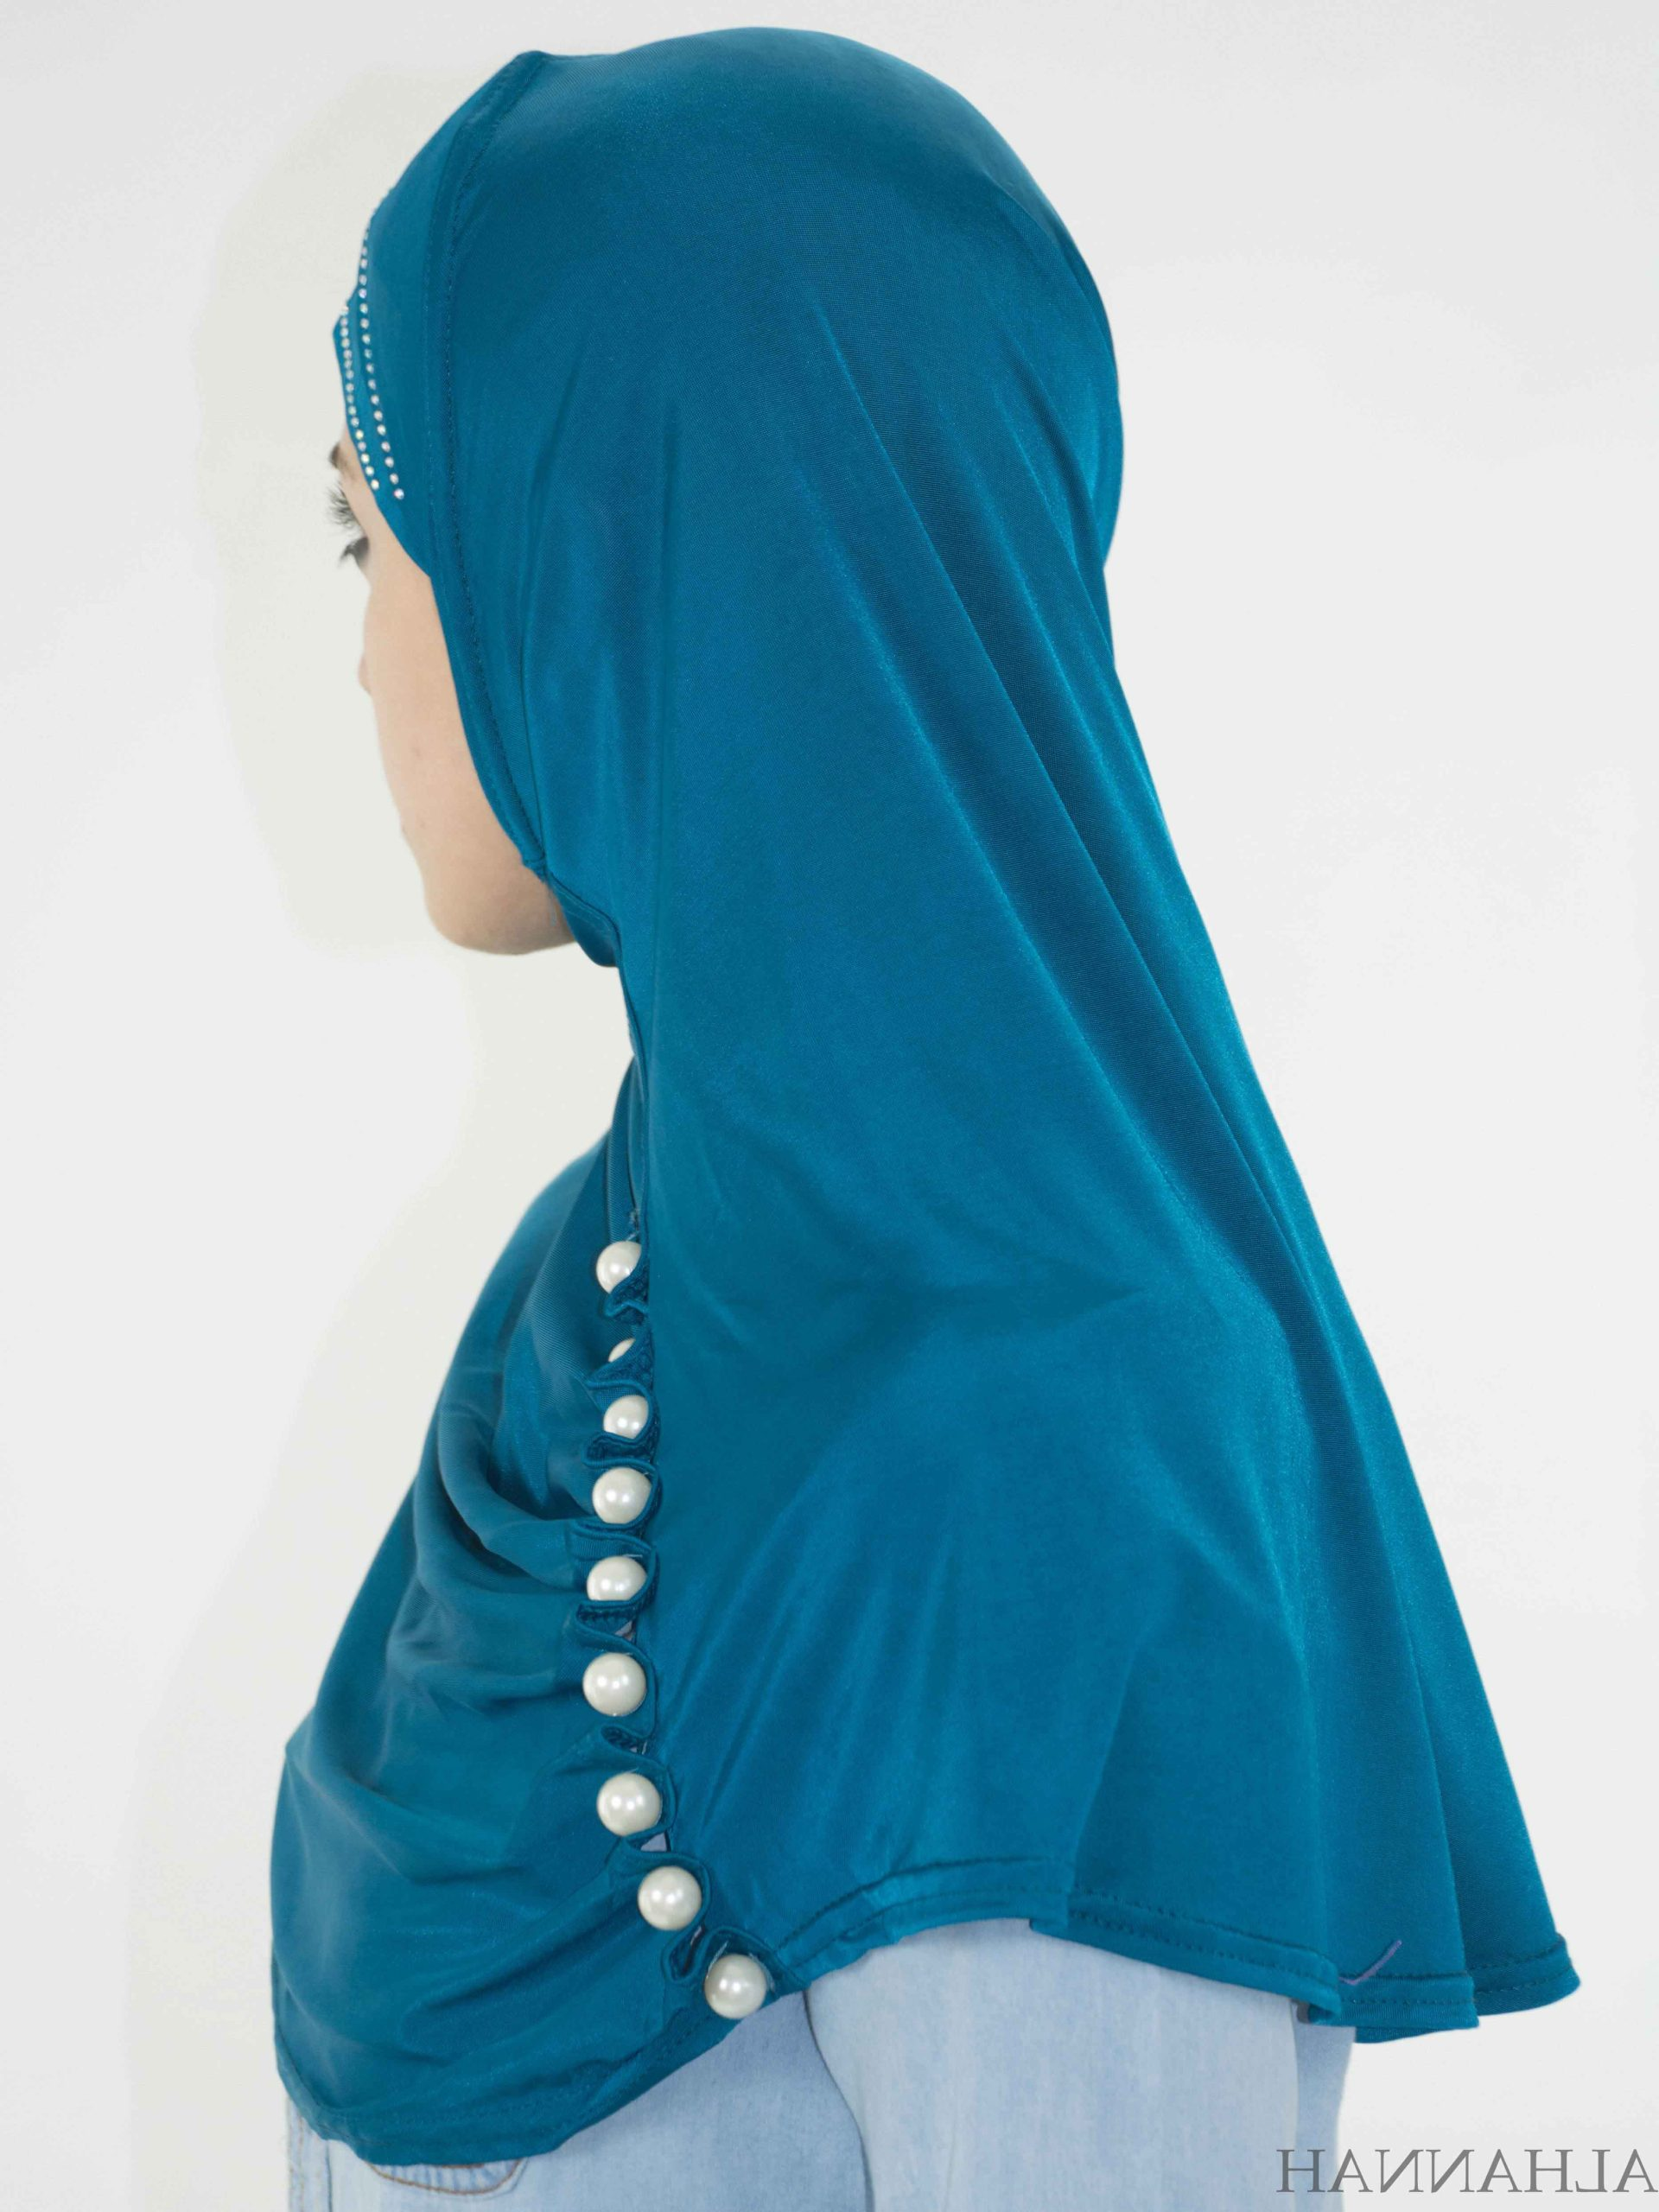 Pearled One-Piece Al-Amira Hijab HI2134 (44)